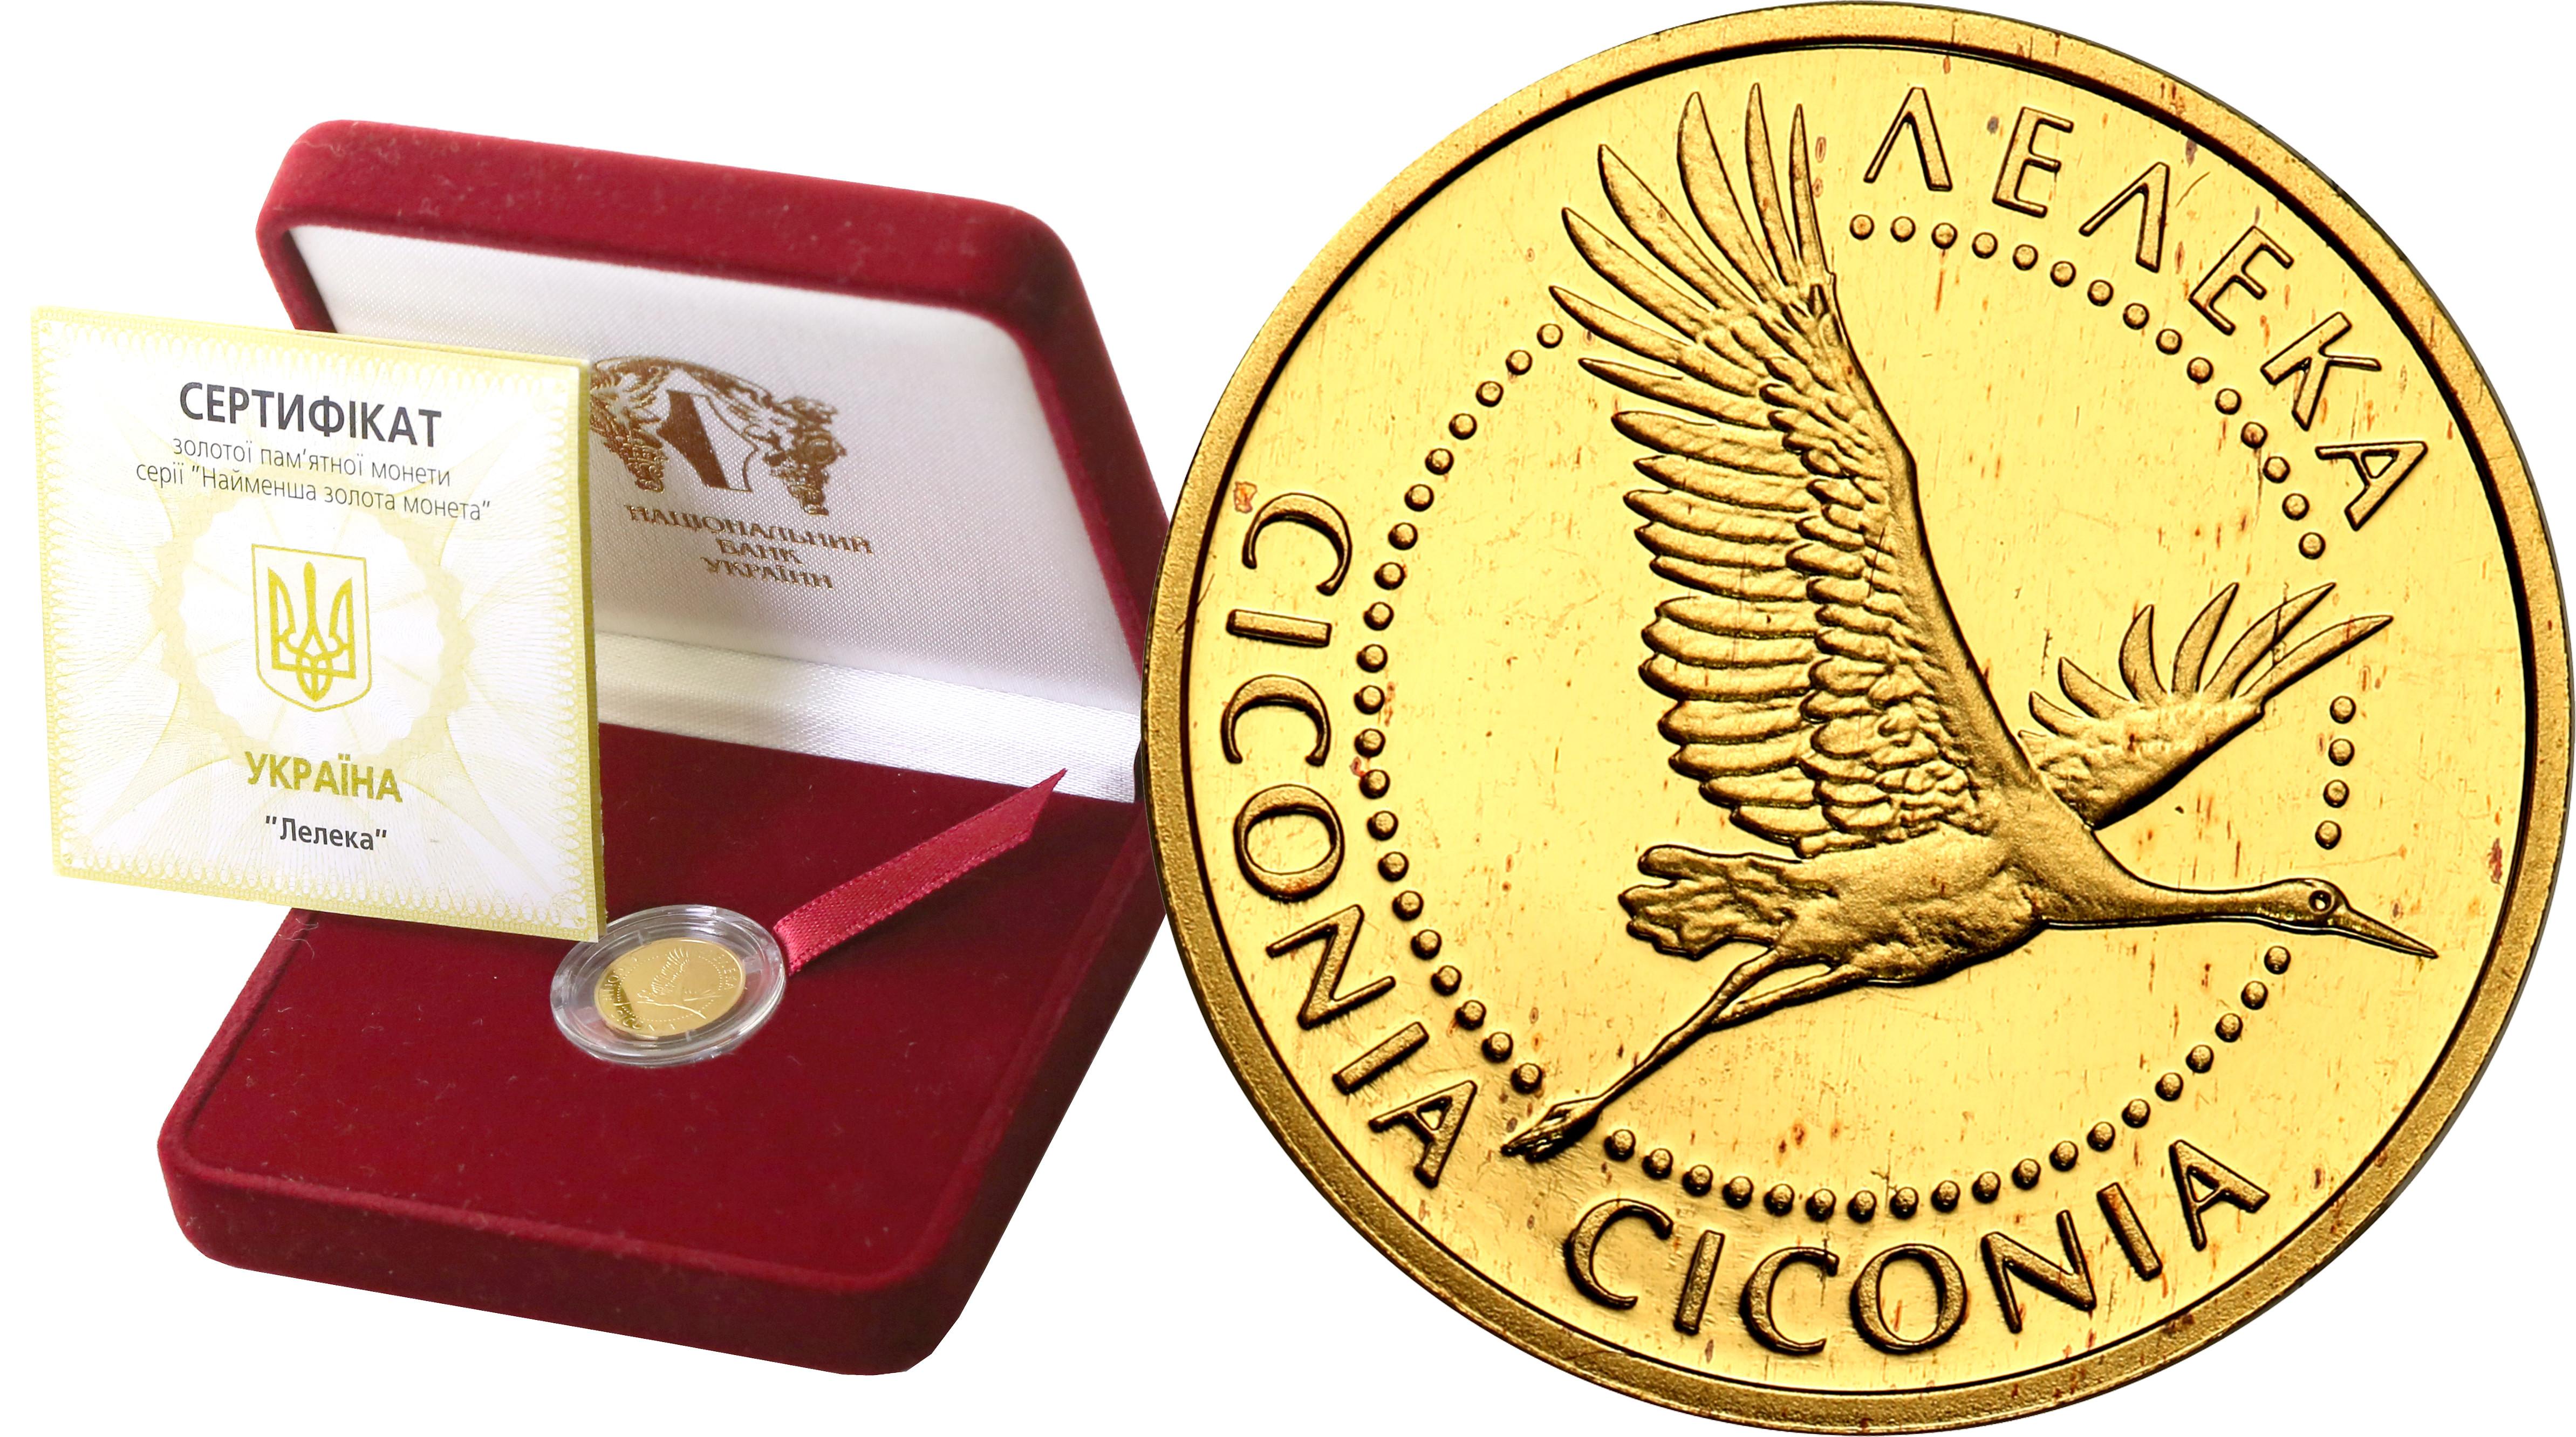 Ukraina 2 hrywny 2006 Bocian 1/25 uncji czystego złota st. L